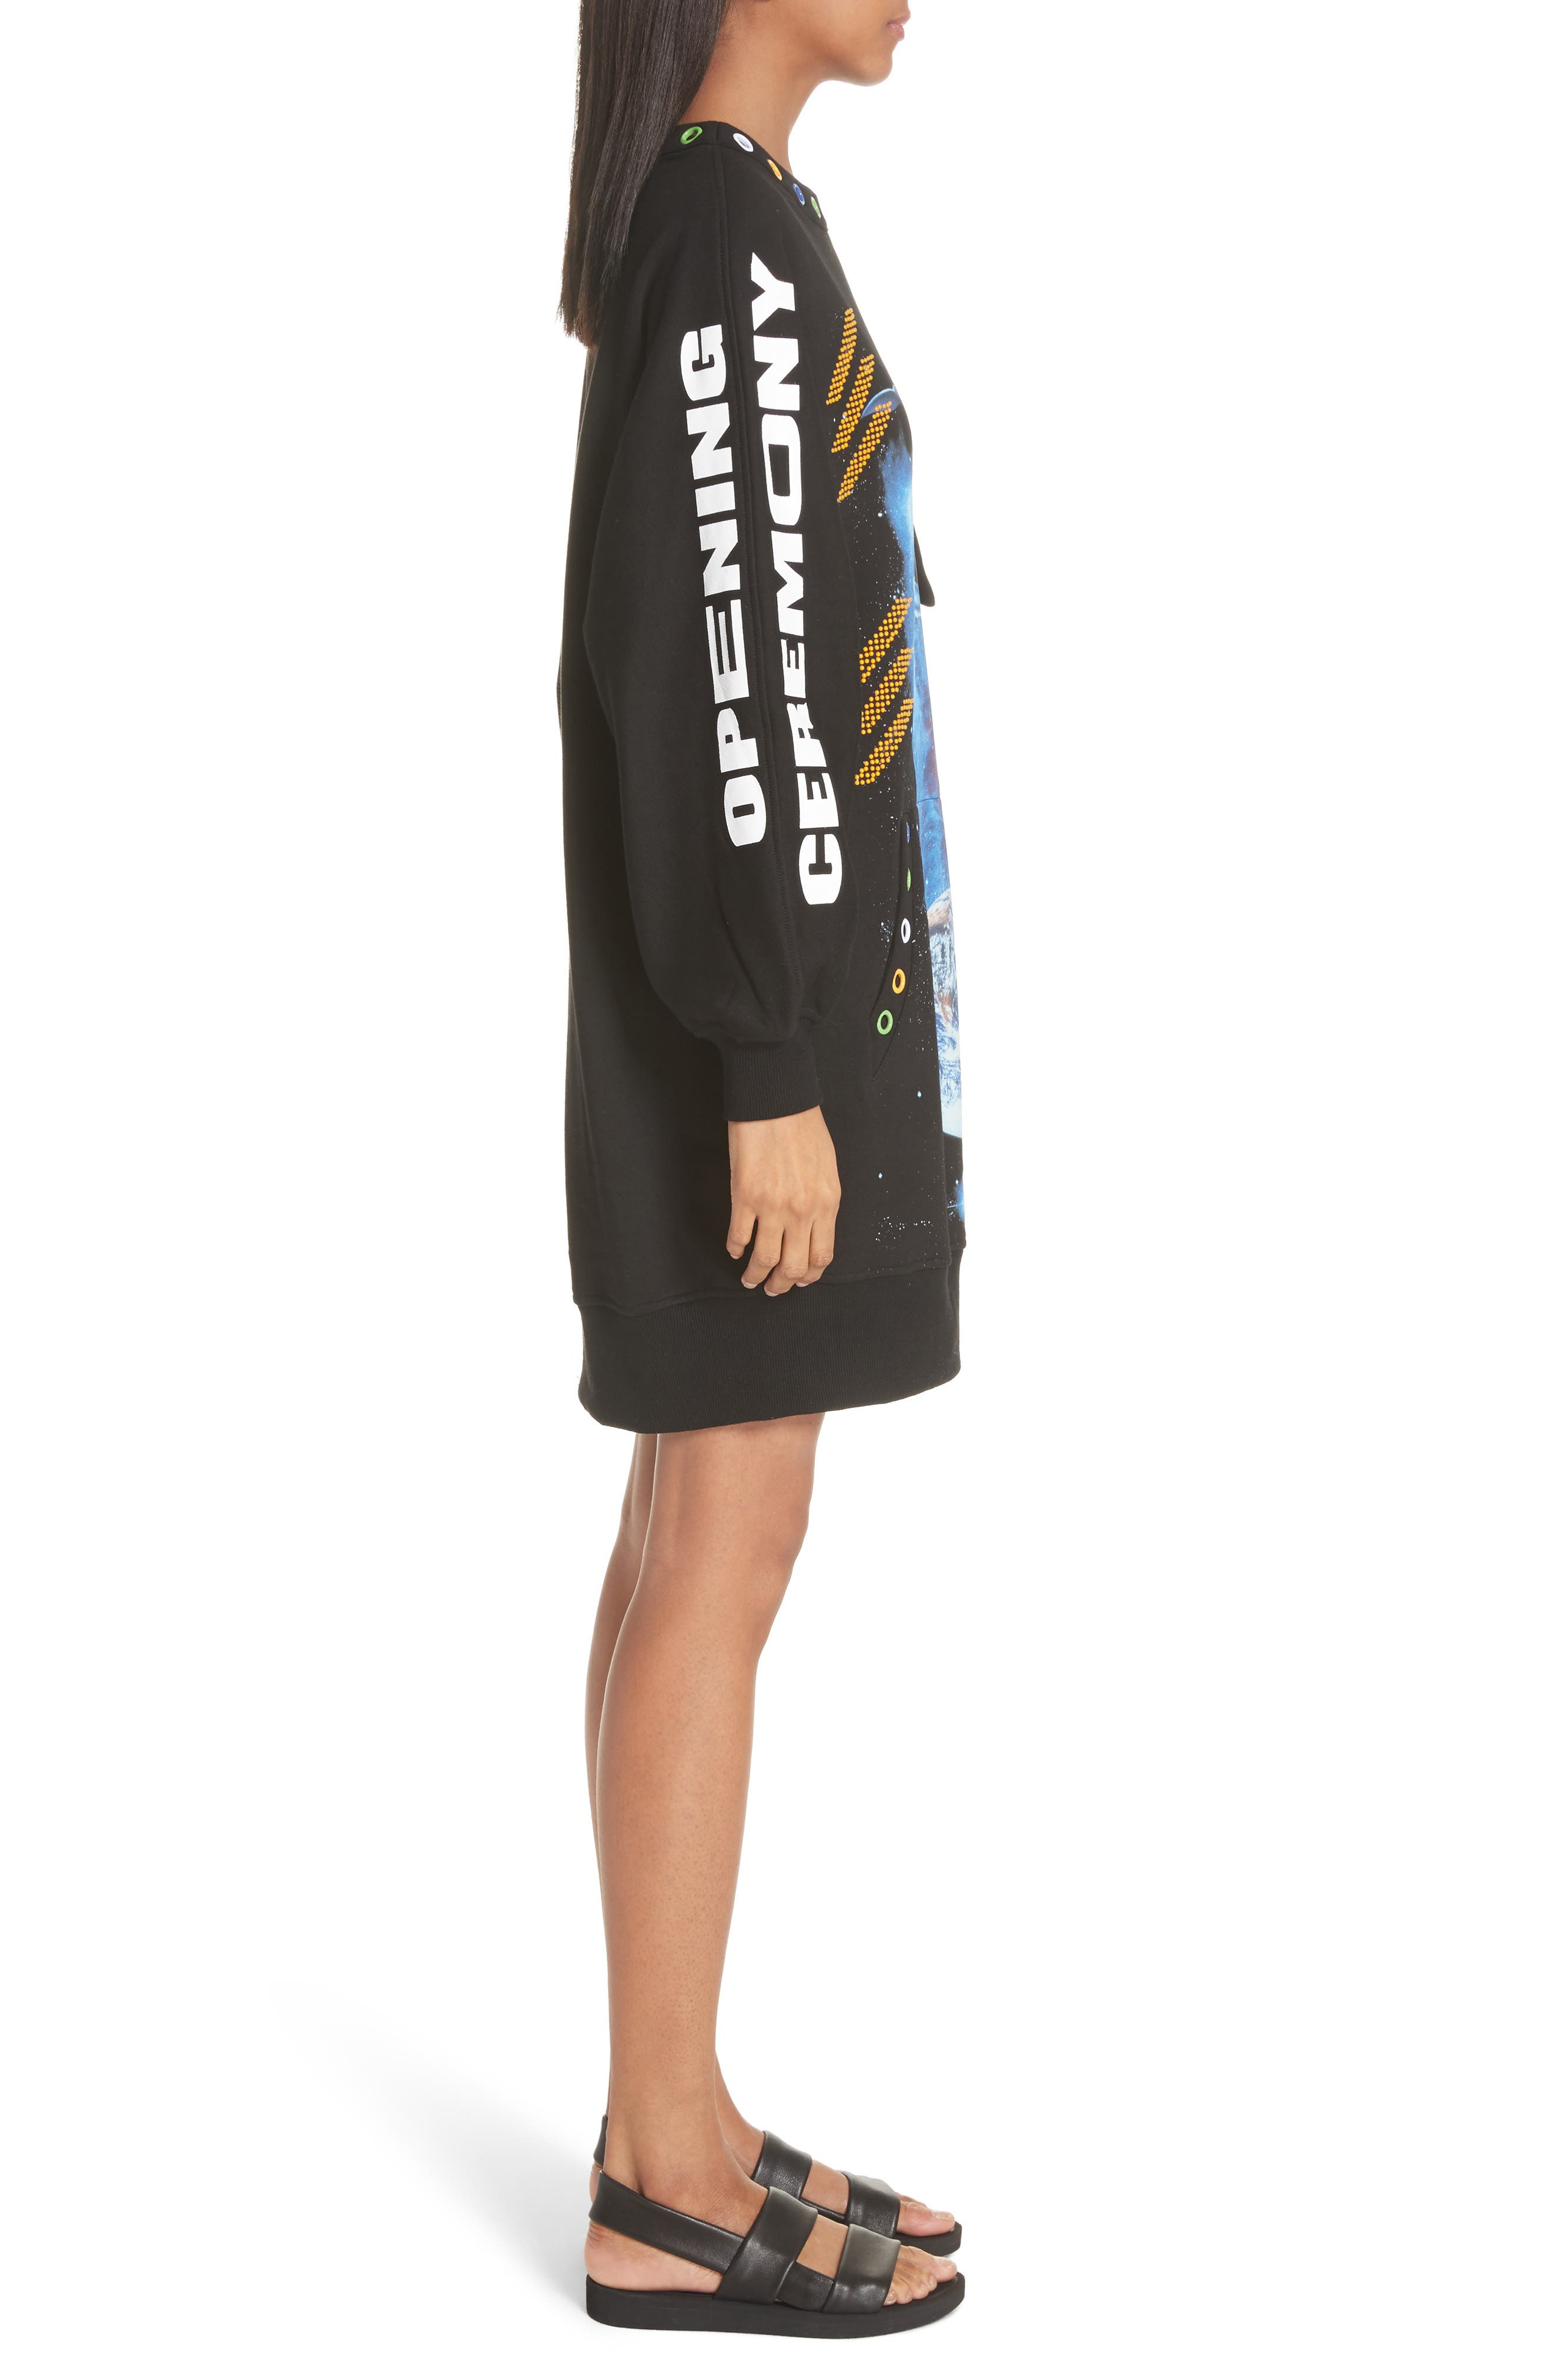 Christian Riese Lassen Sweatshirt Dress,                             Alternate thumbnail 3, color,                             Black